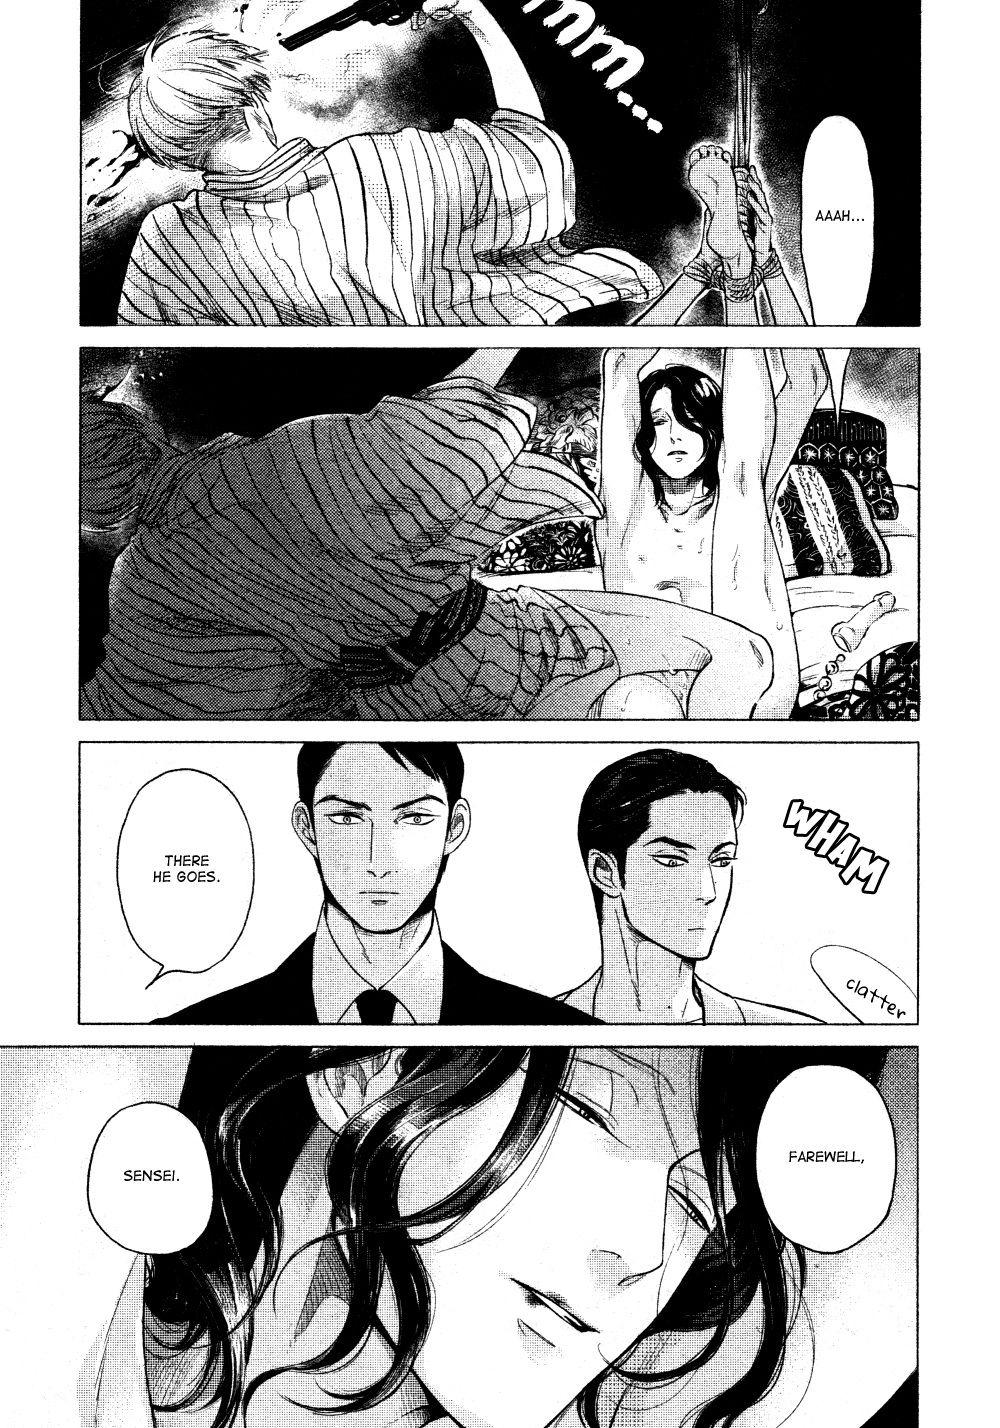 Jealousy Scarlet Beriko Ch 1 Page 19 Mangago Webtoon Jealousy Anime